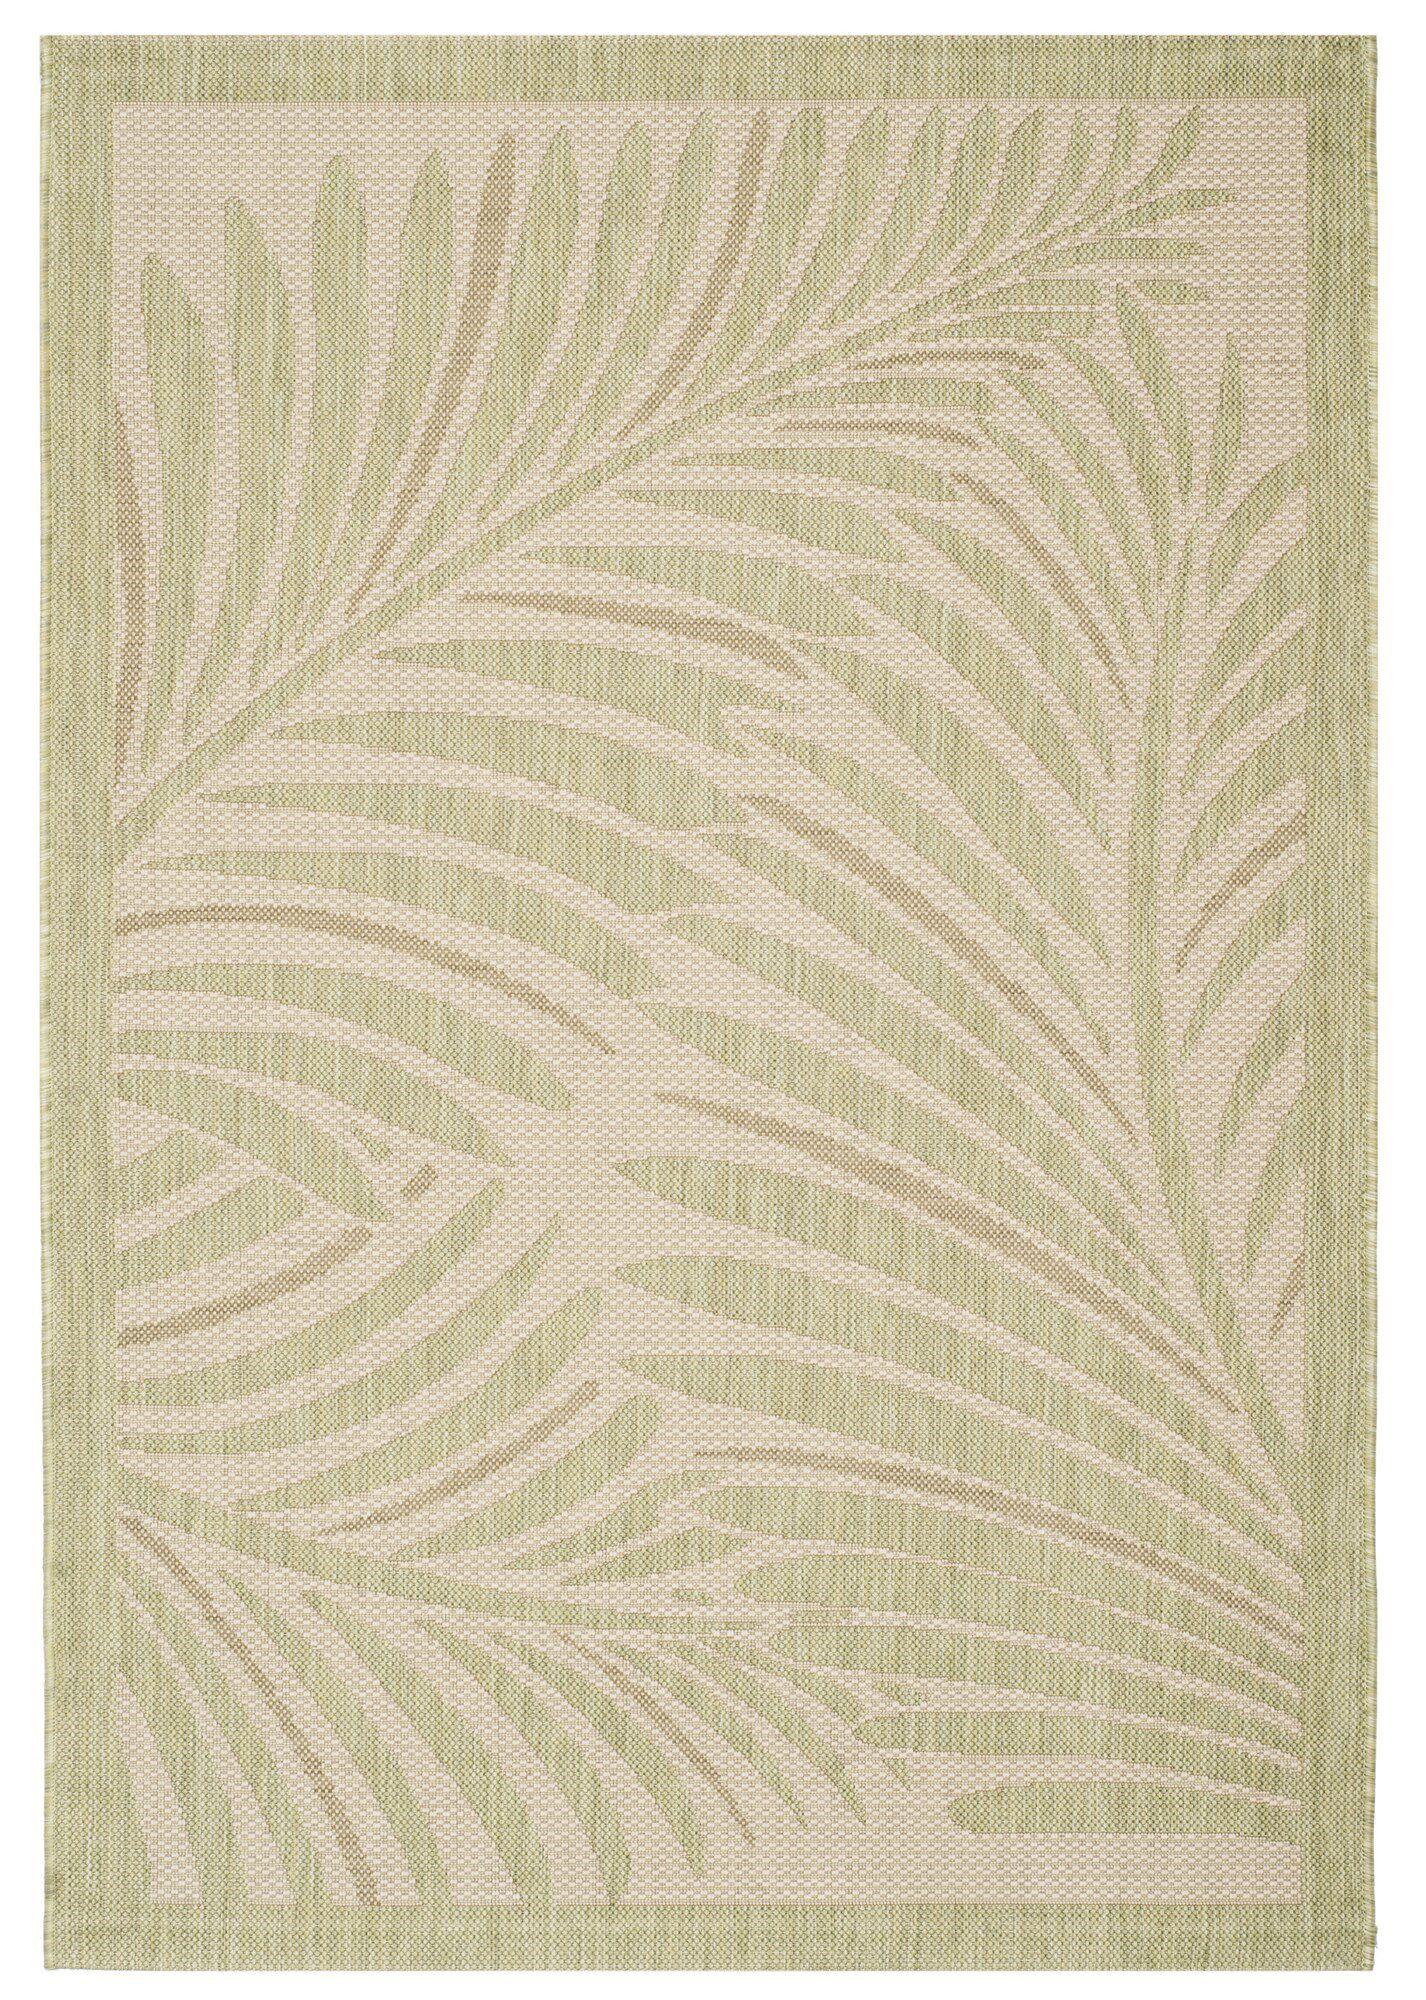 Bridgeville Tropic Palm Tan Area Rug Rug Size: Rectangle 4' x 5'7